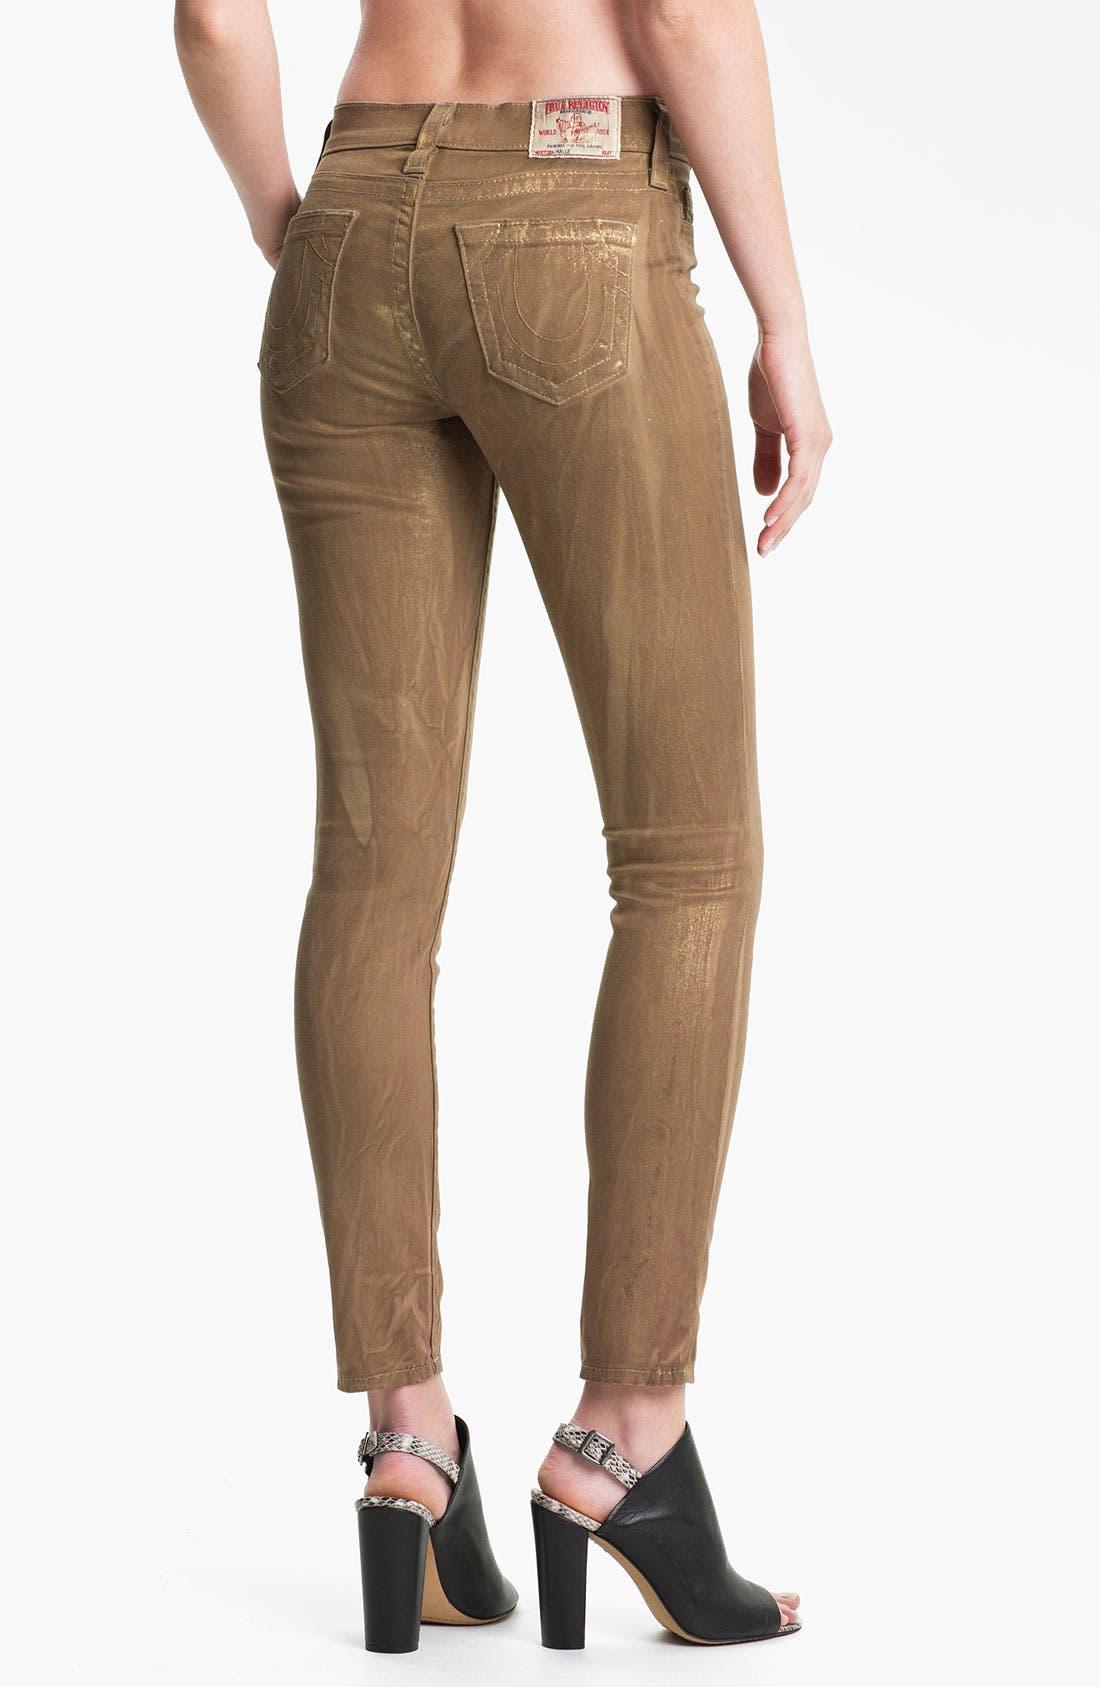 Alternate Image 2  - True Religion Brand Jeans 'Halle' Skinny Stretch Jeans (Metallic Gold)